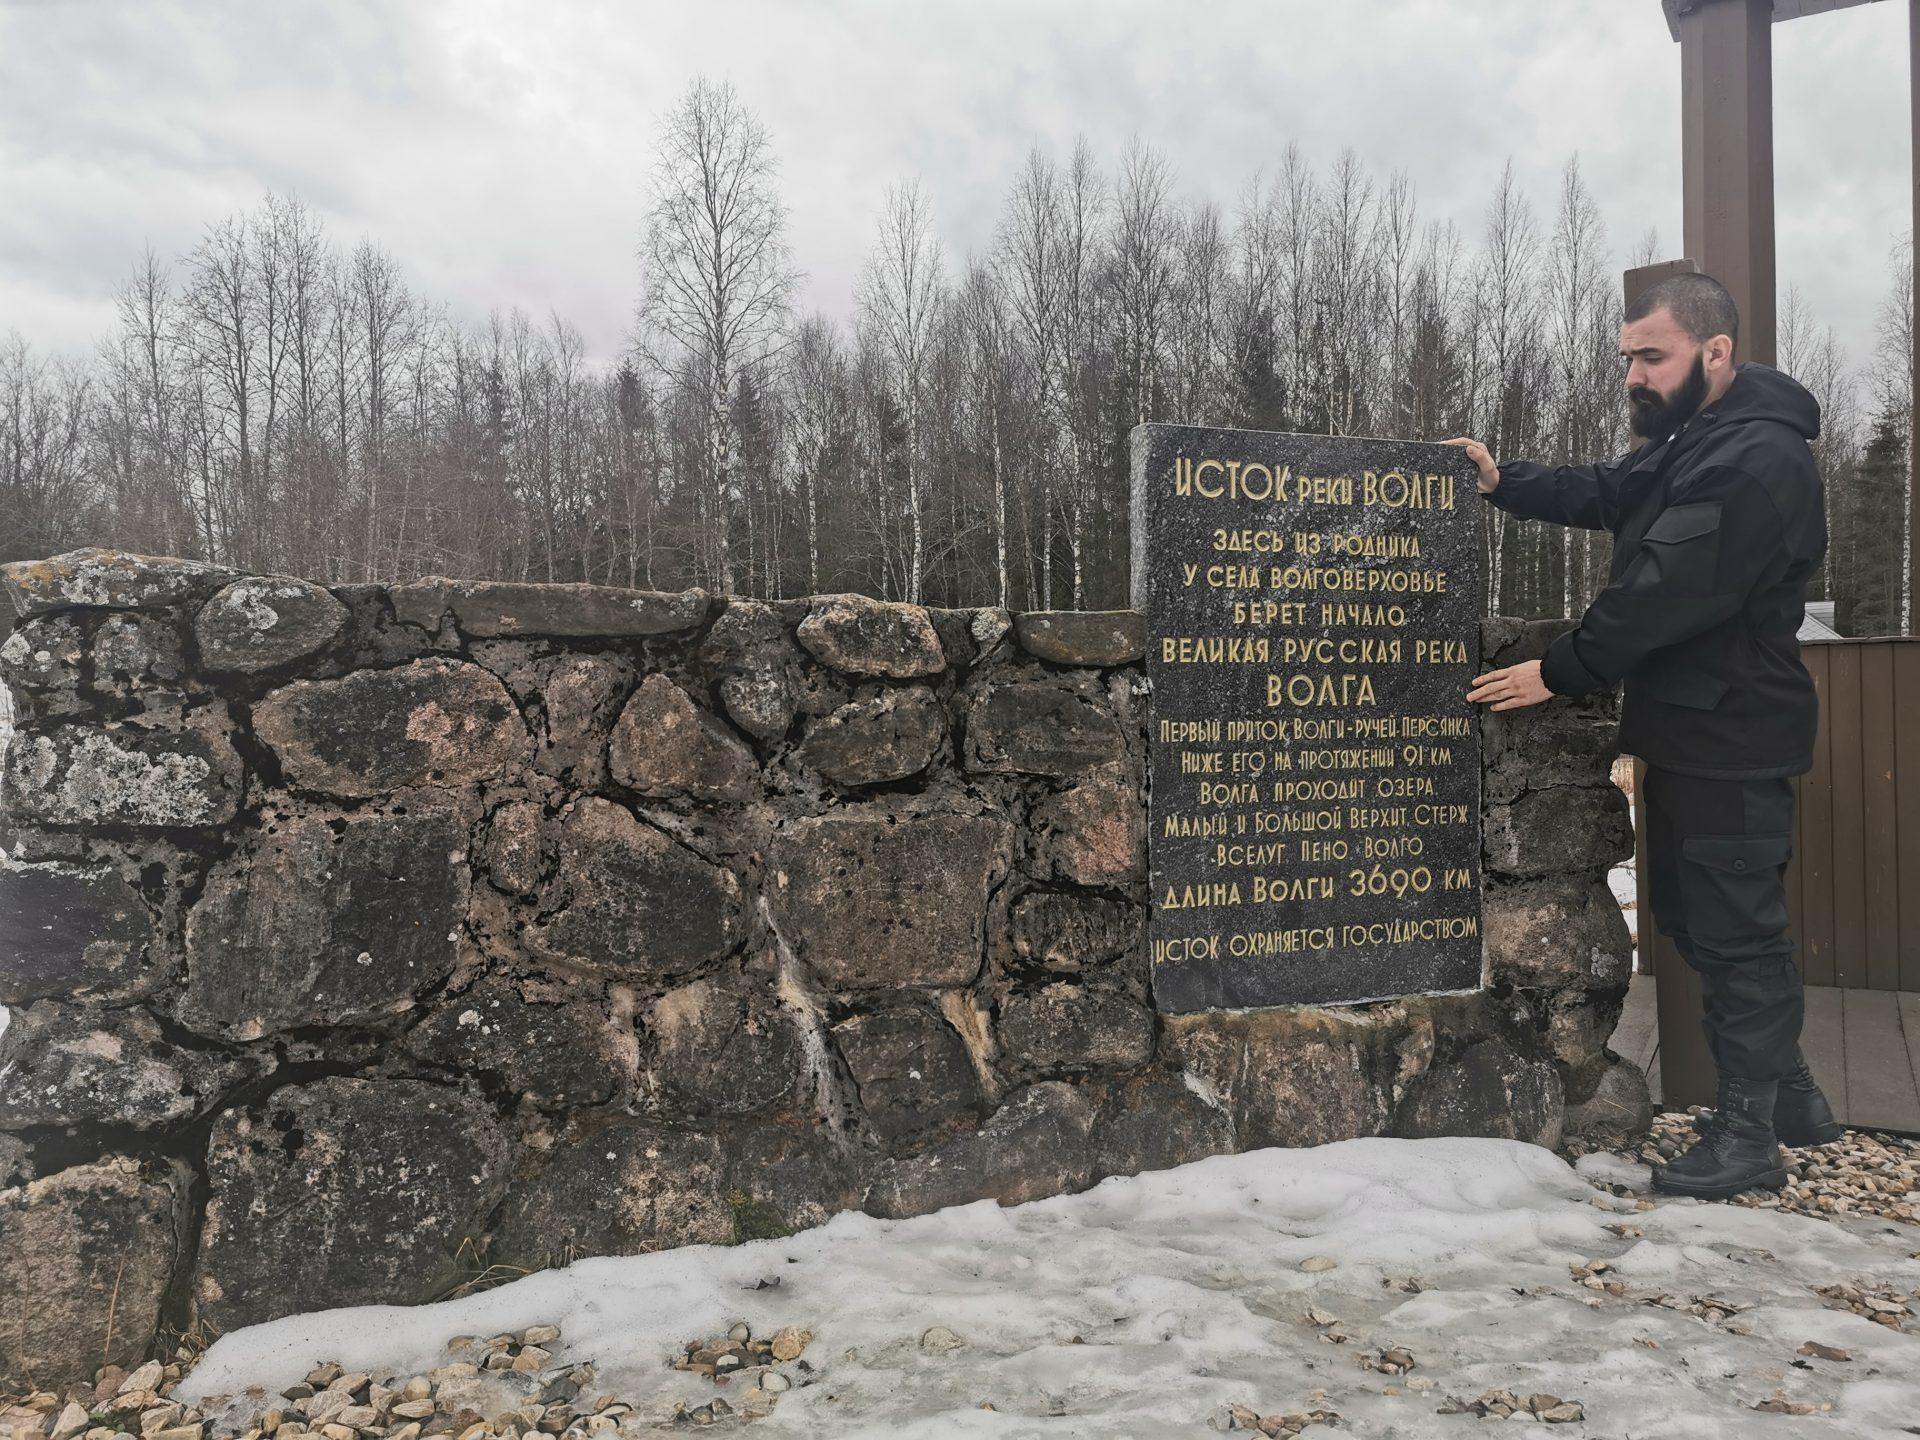 Откуда берет начало Волга? (материал из экспедиции)